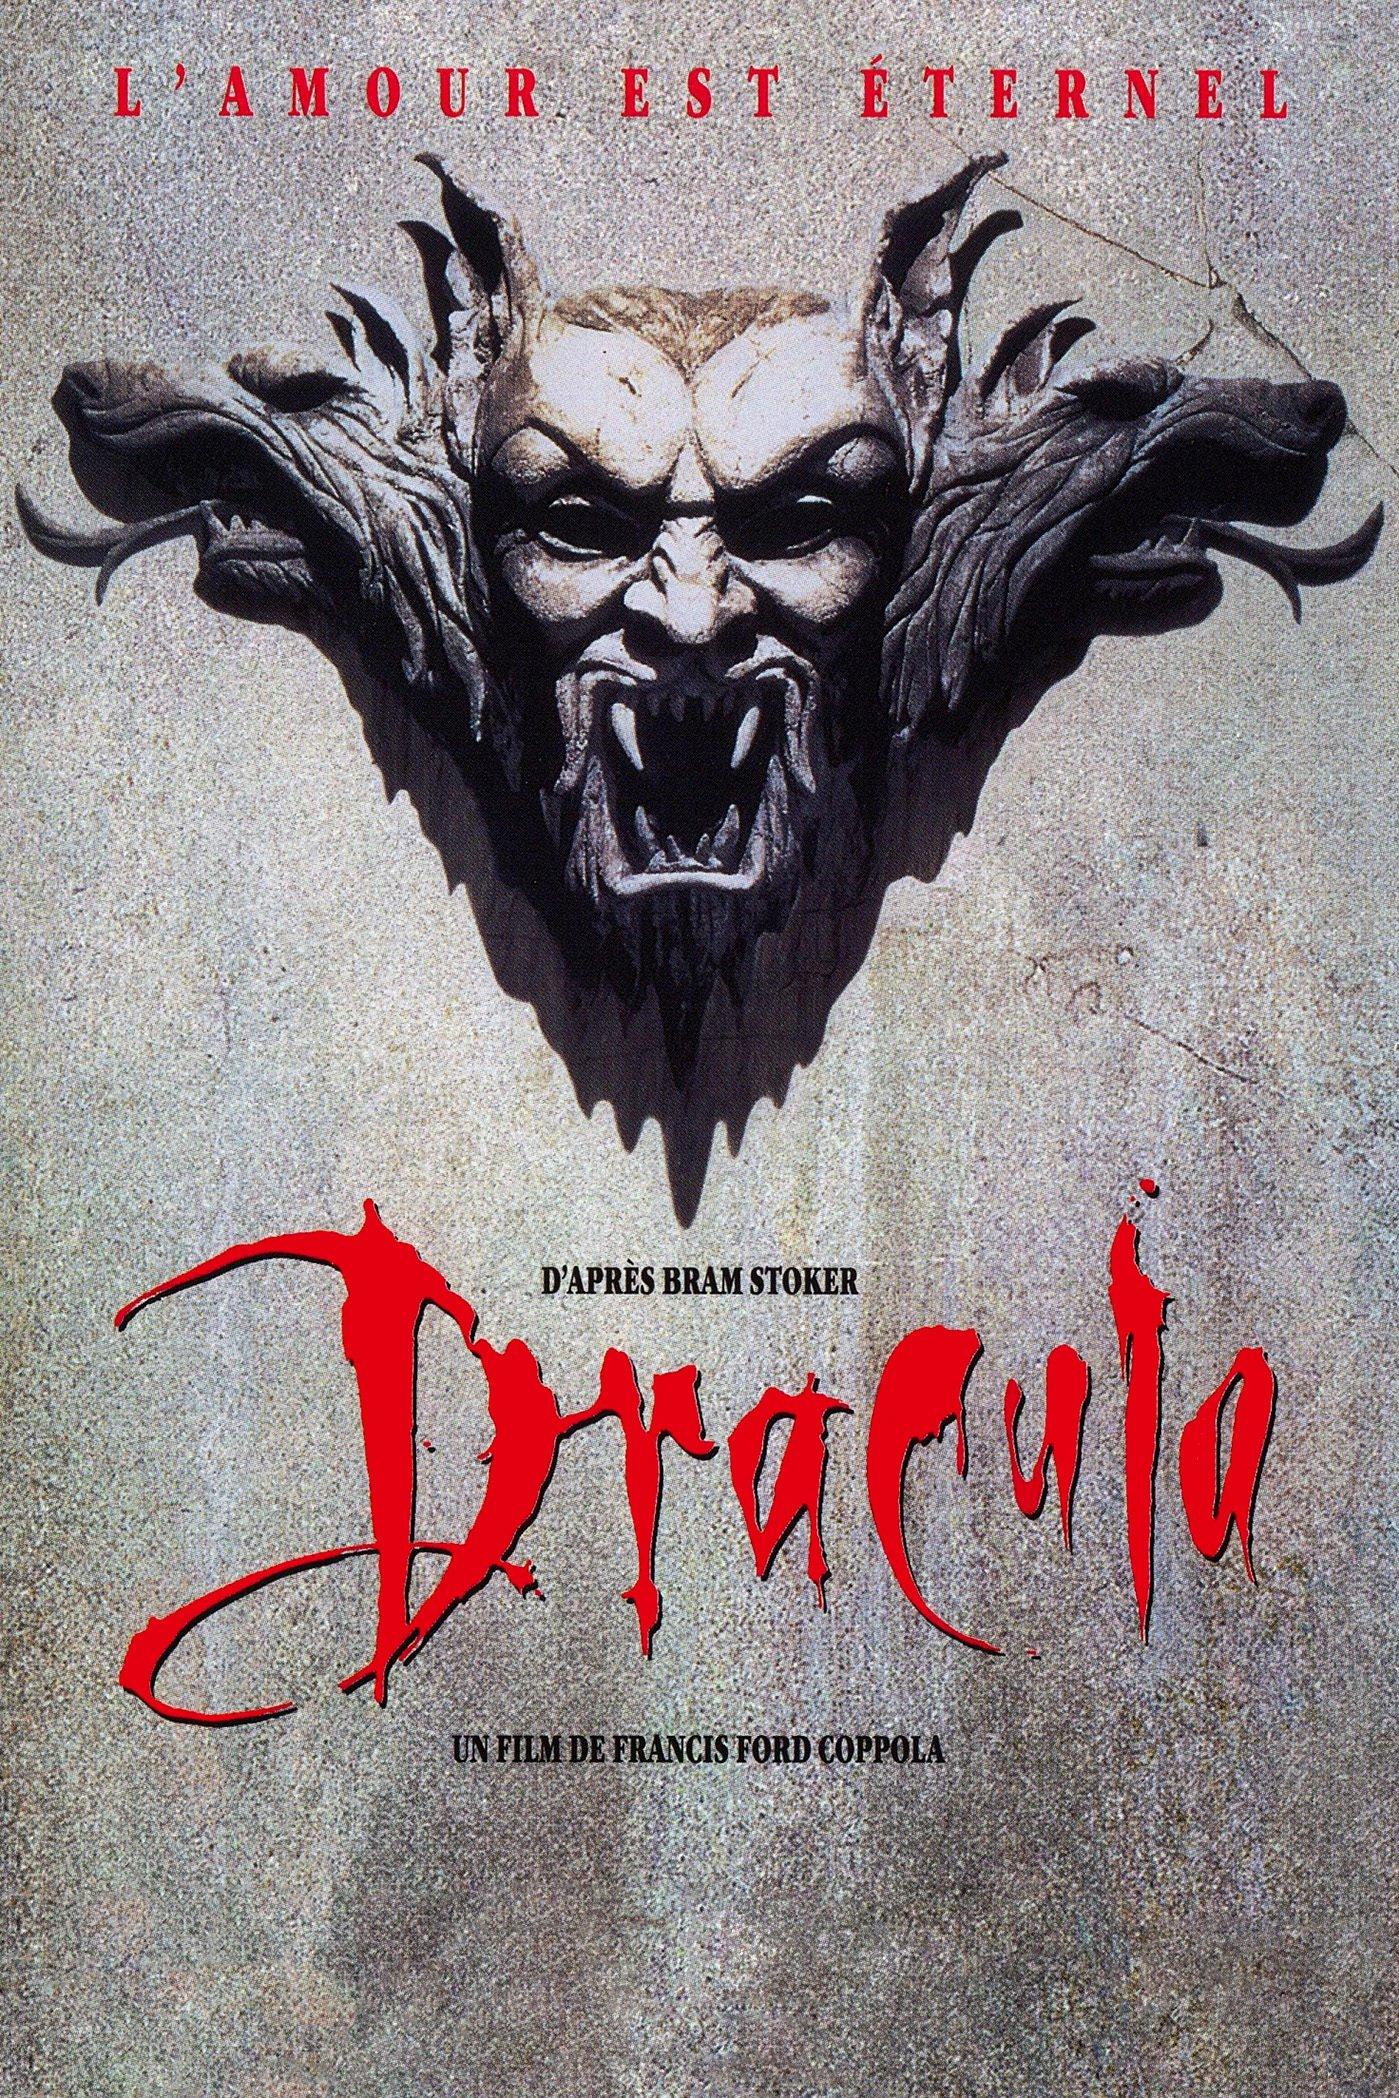 Regarder Dracula en streaming gratuit